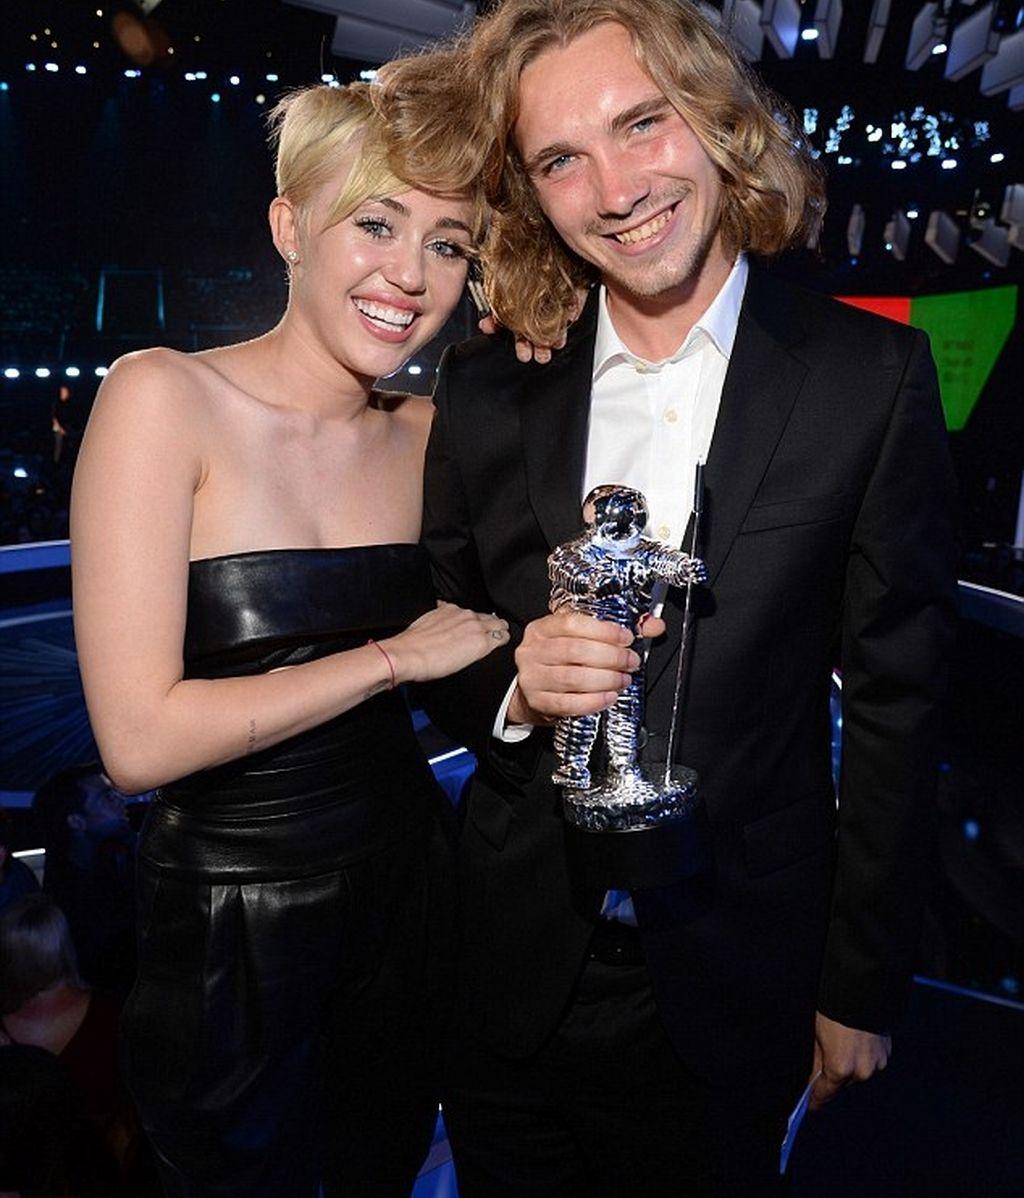 Jesse Helt y Miley Cyrus